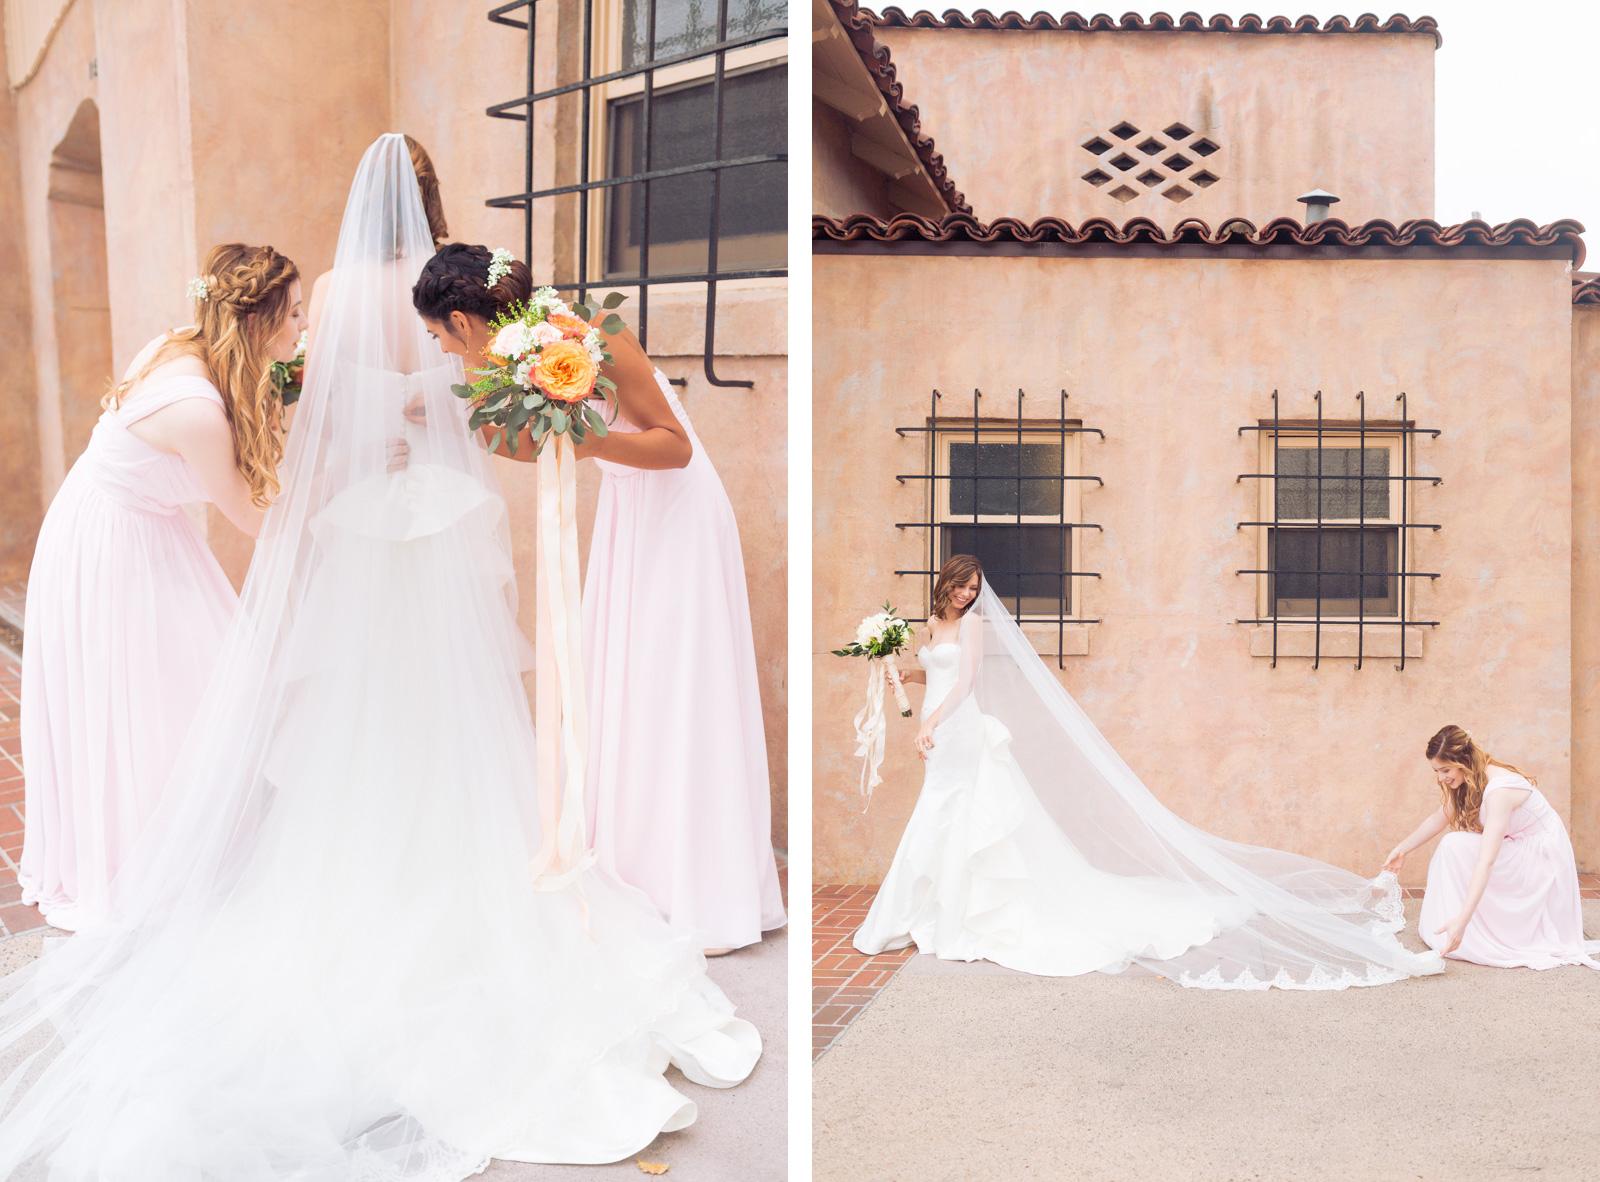 Southern-California-Hacienda-Wedding_03.jpg